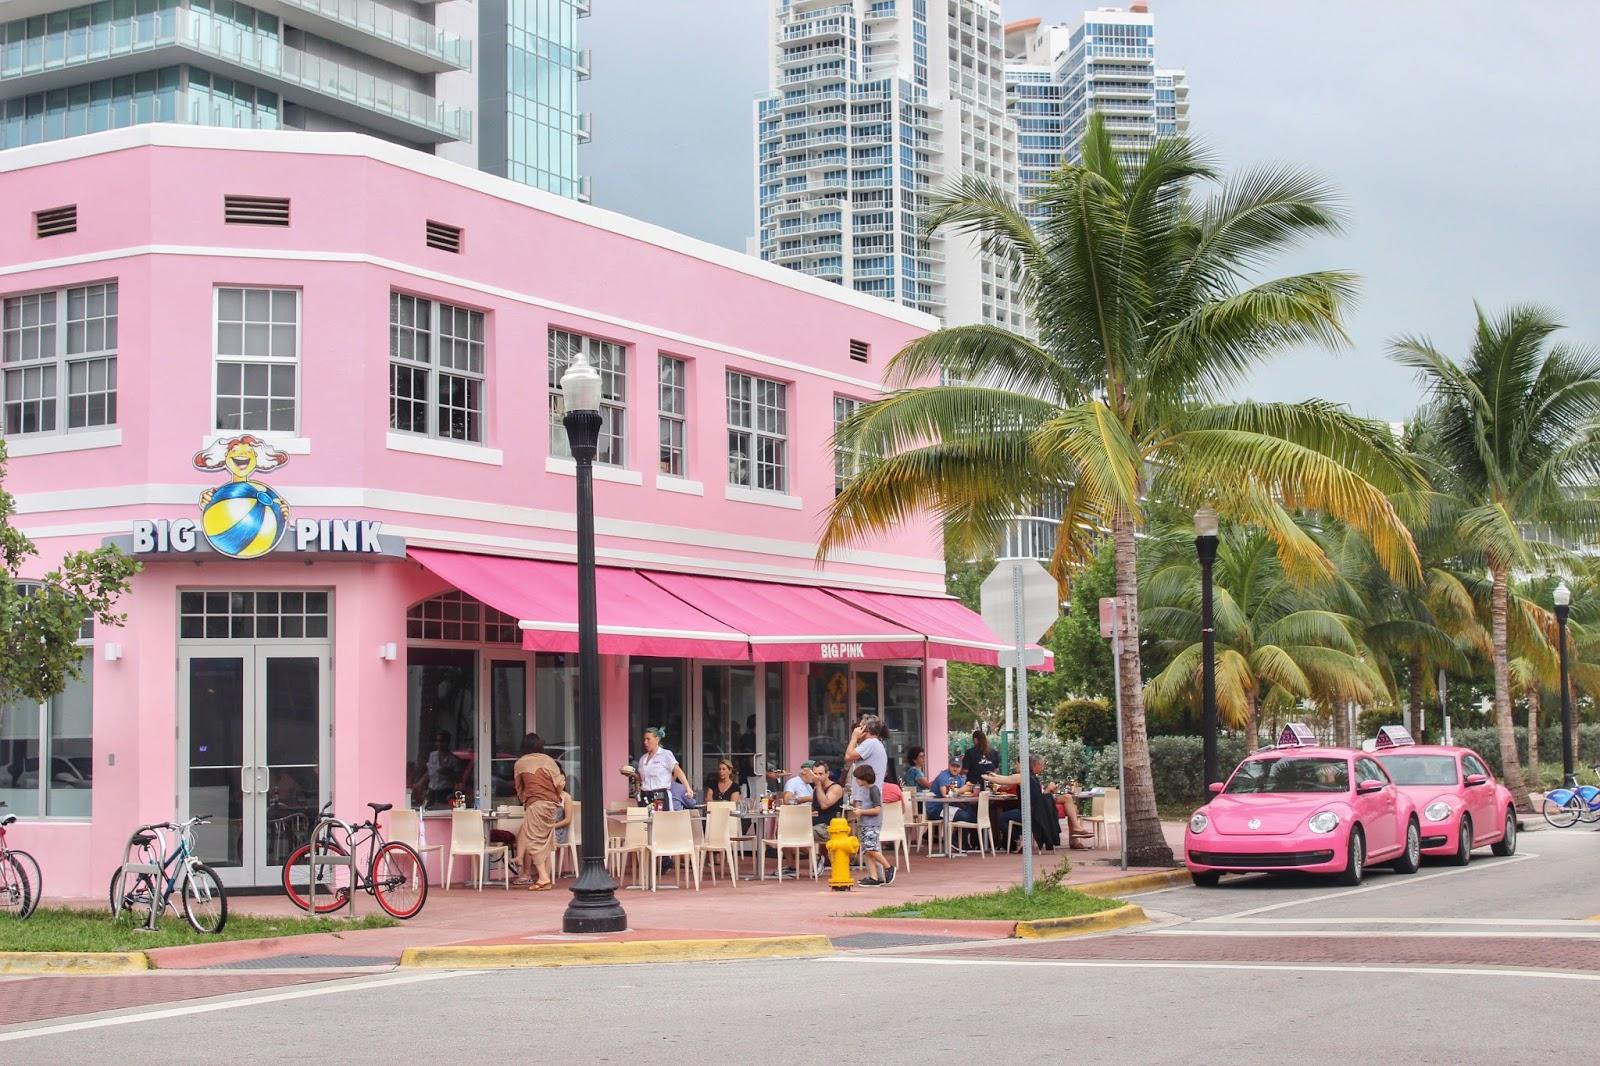 lifesthayle-miami-photodiary-big-pink.jpg